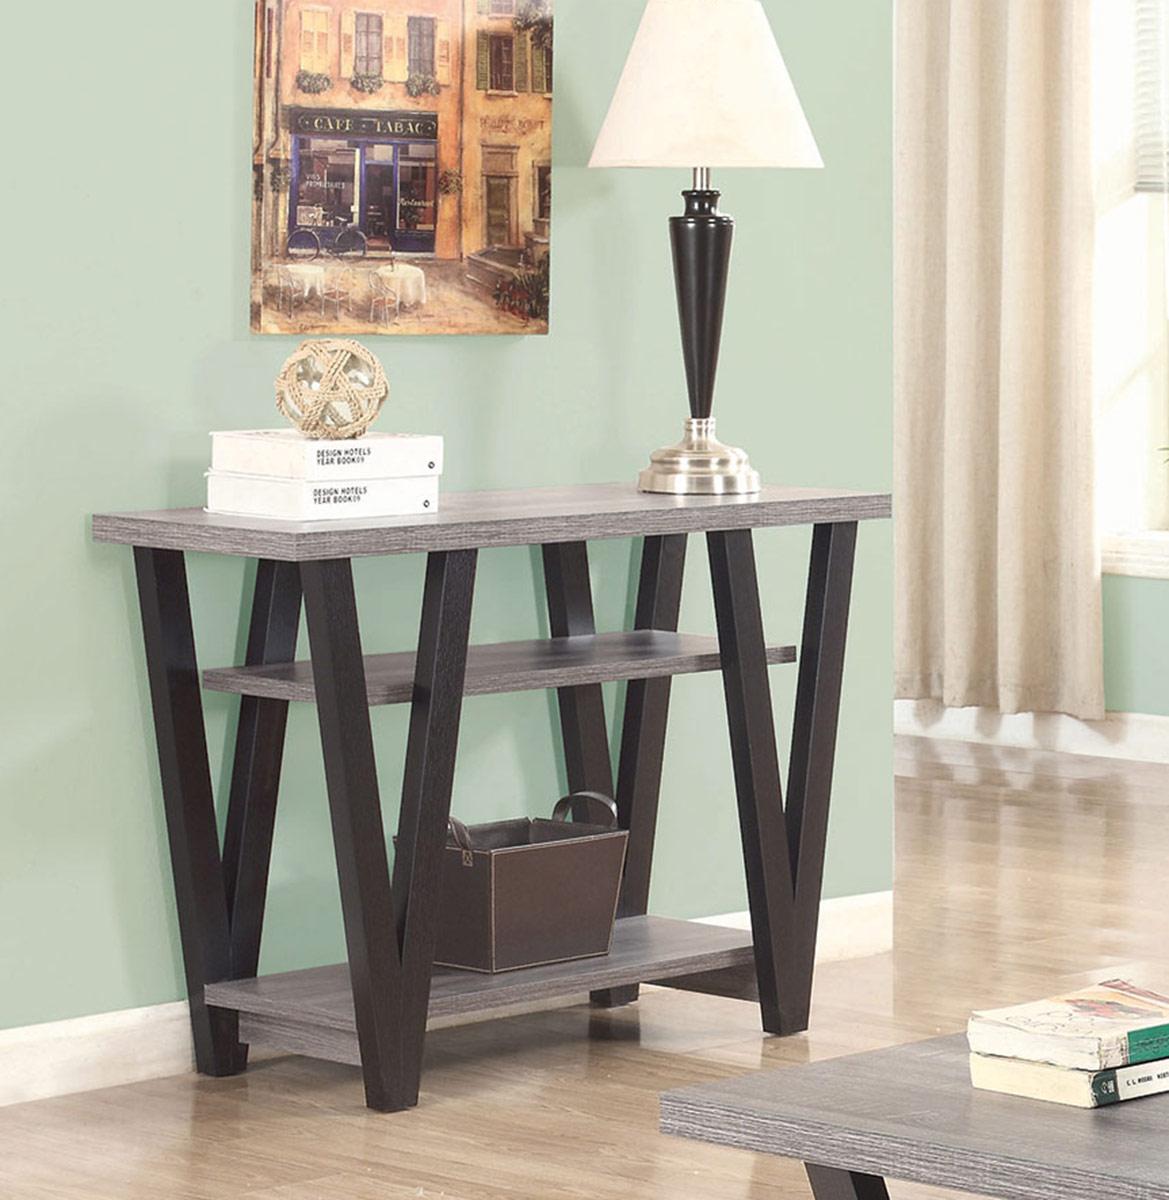 Coaster 705399 Sofa Table - Antique Grey/Black